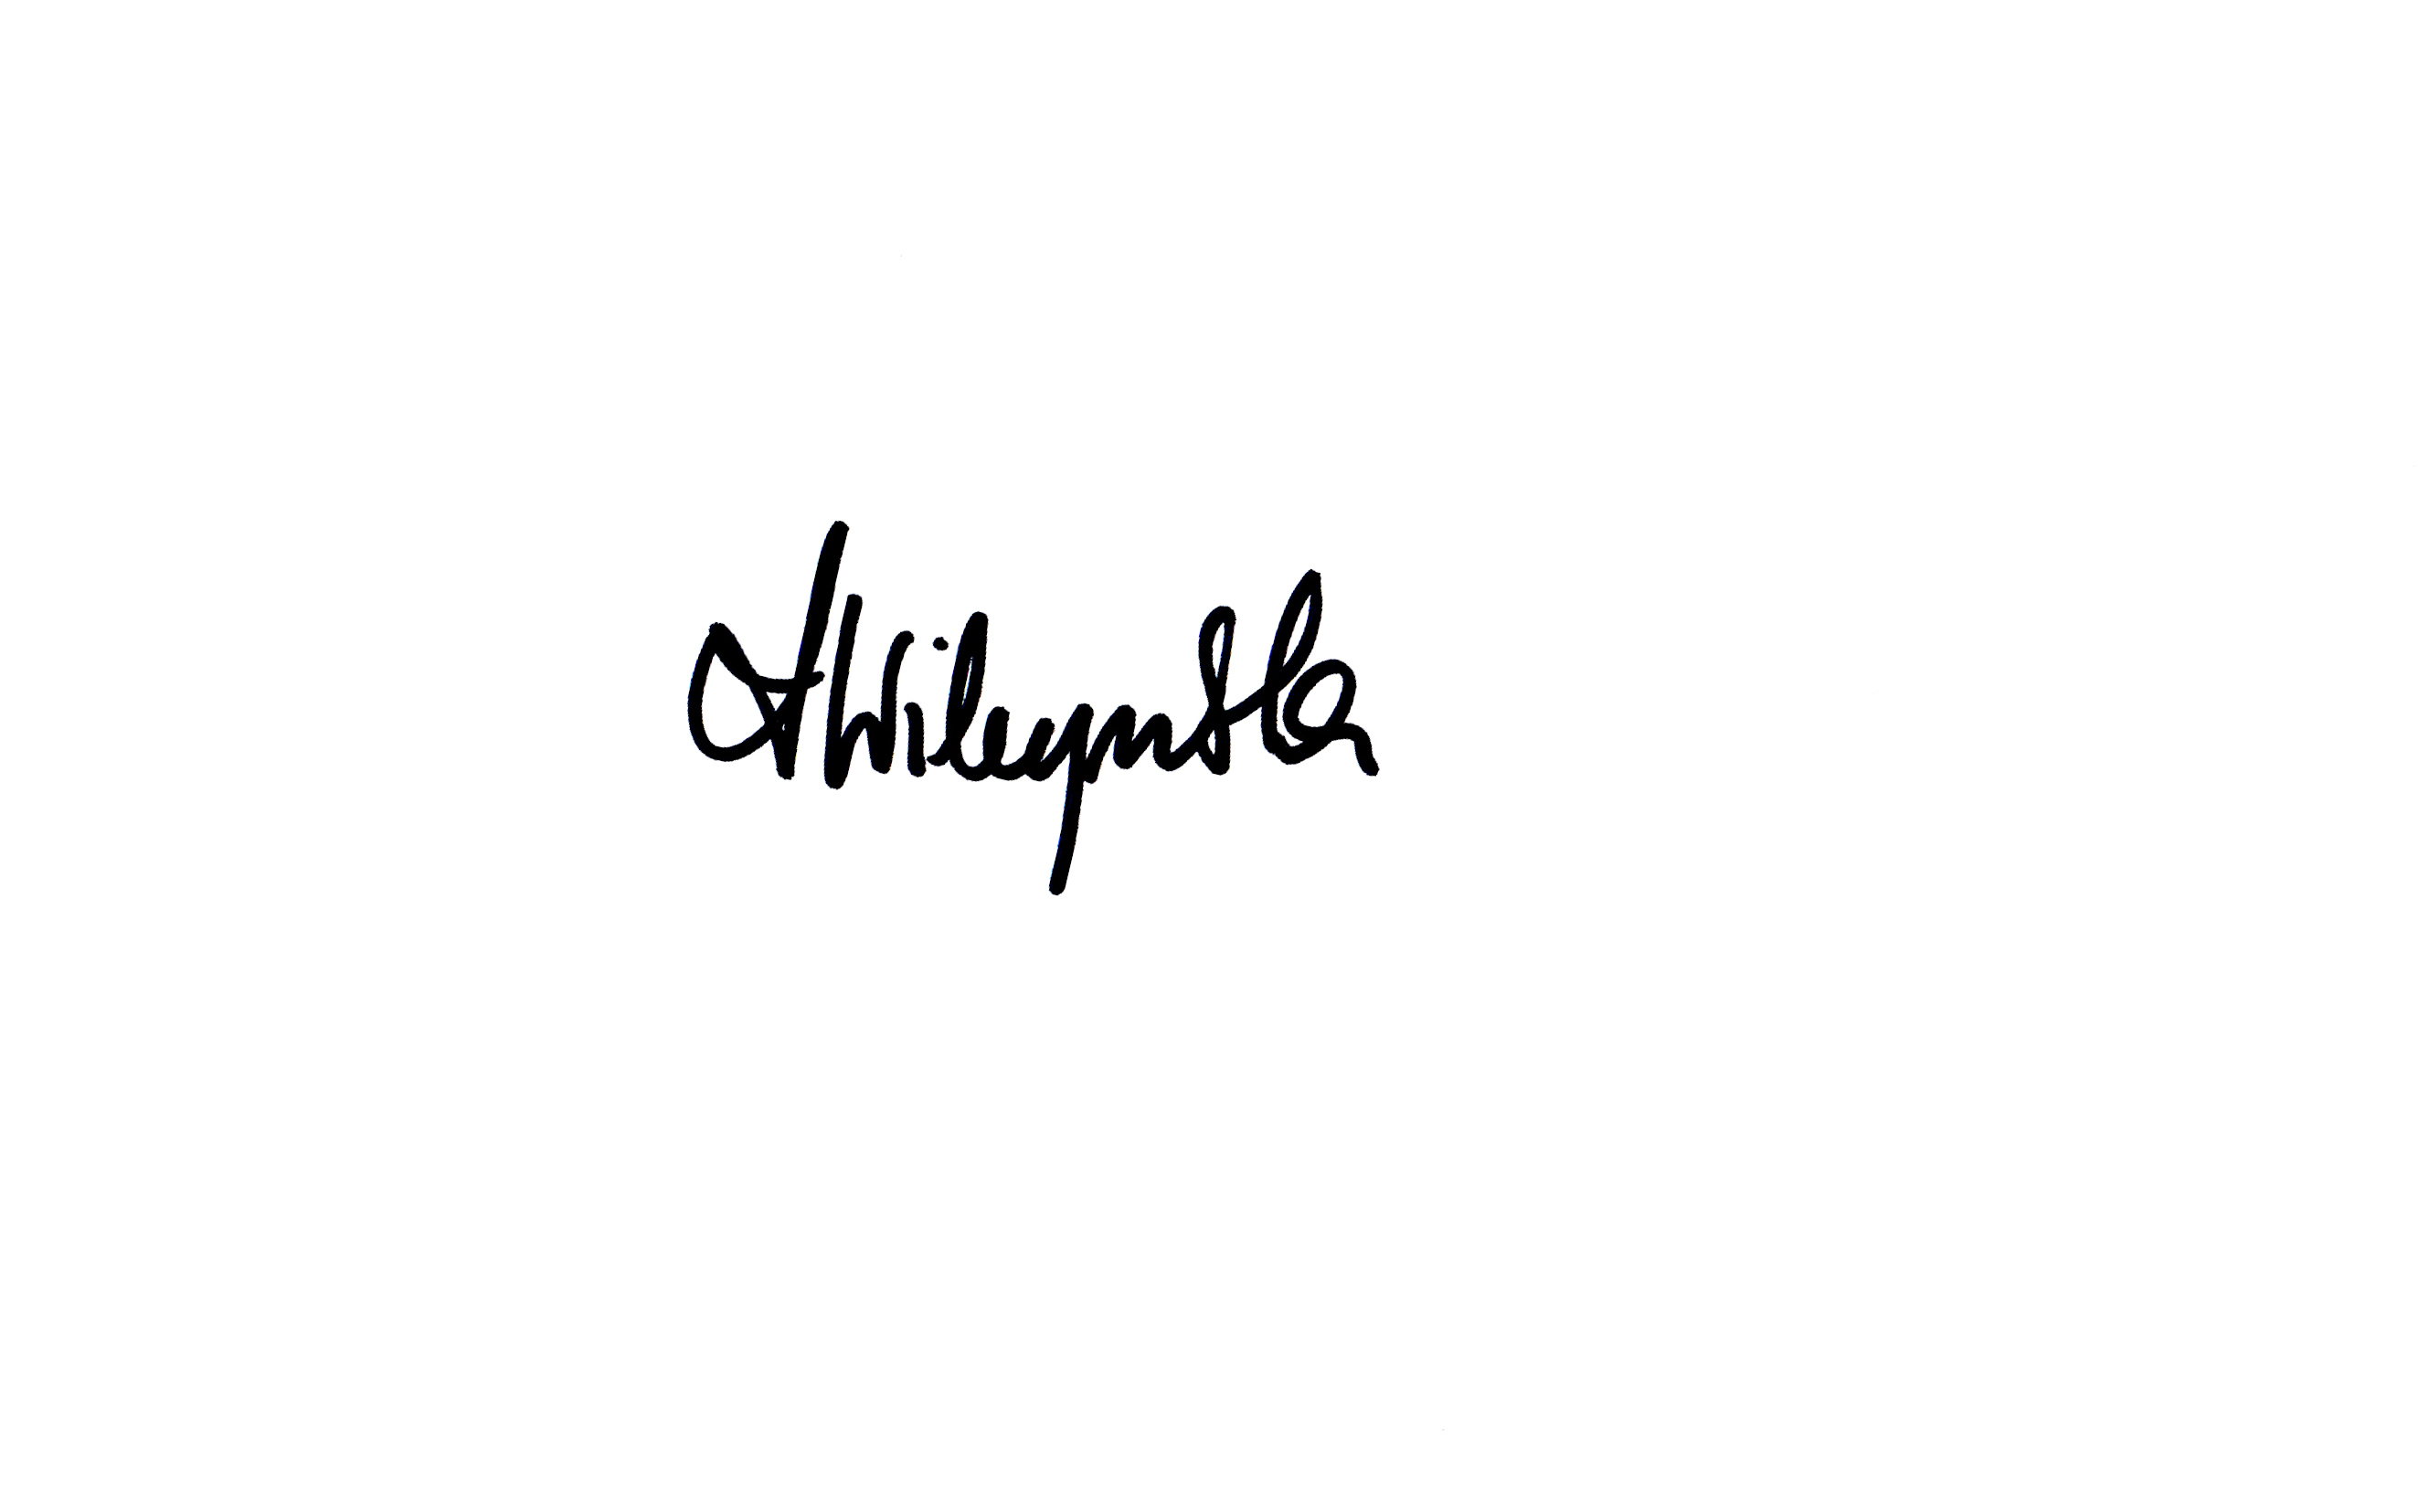 ANNA WILCZYNSKA's Signature